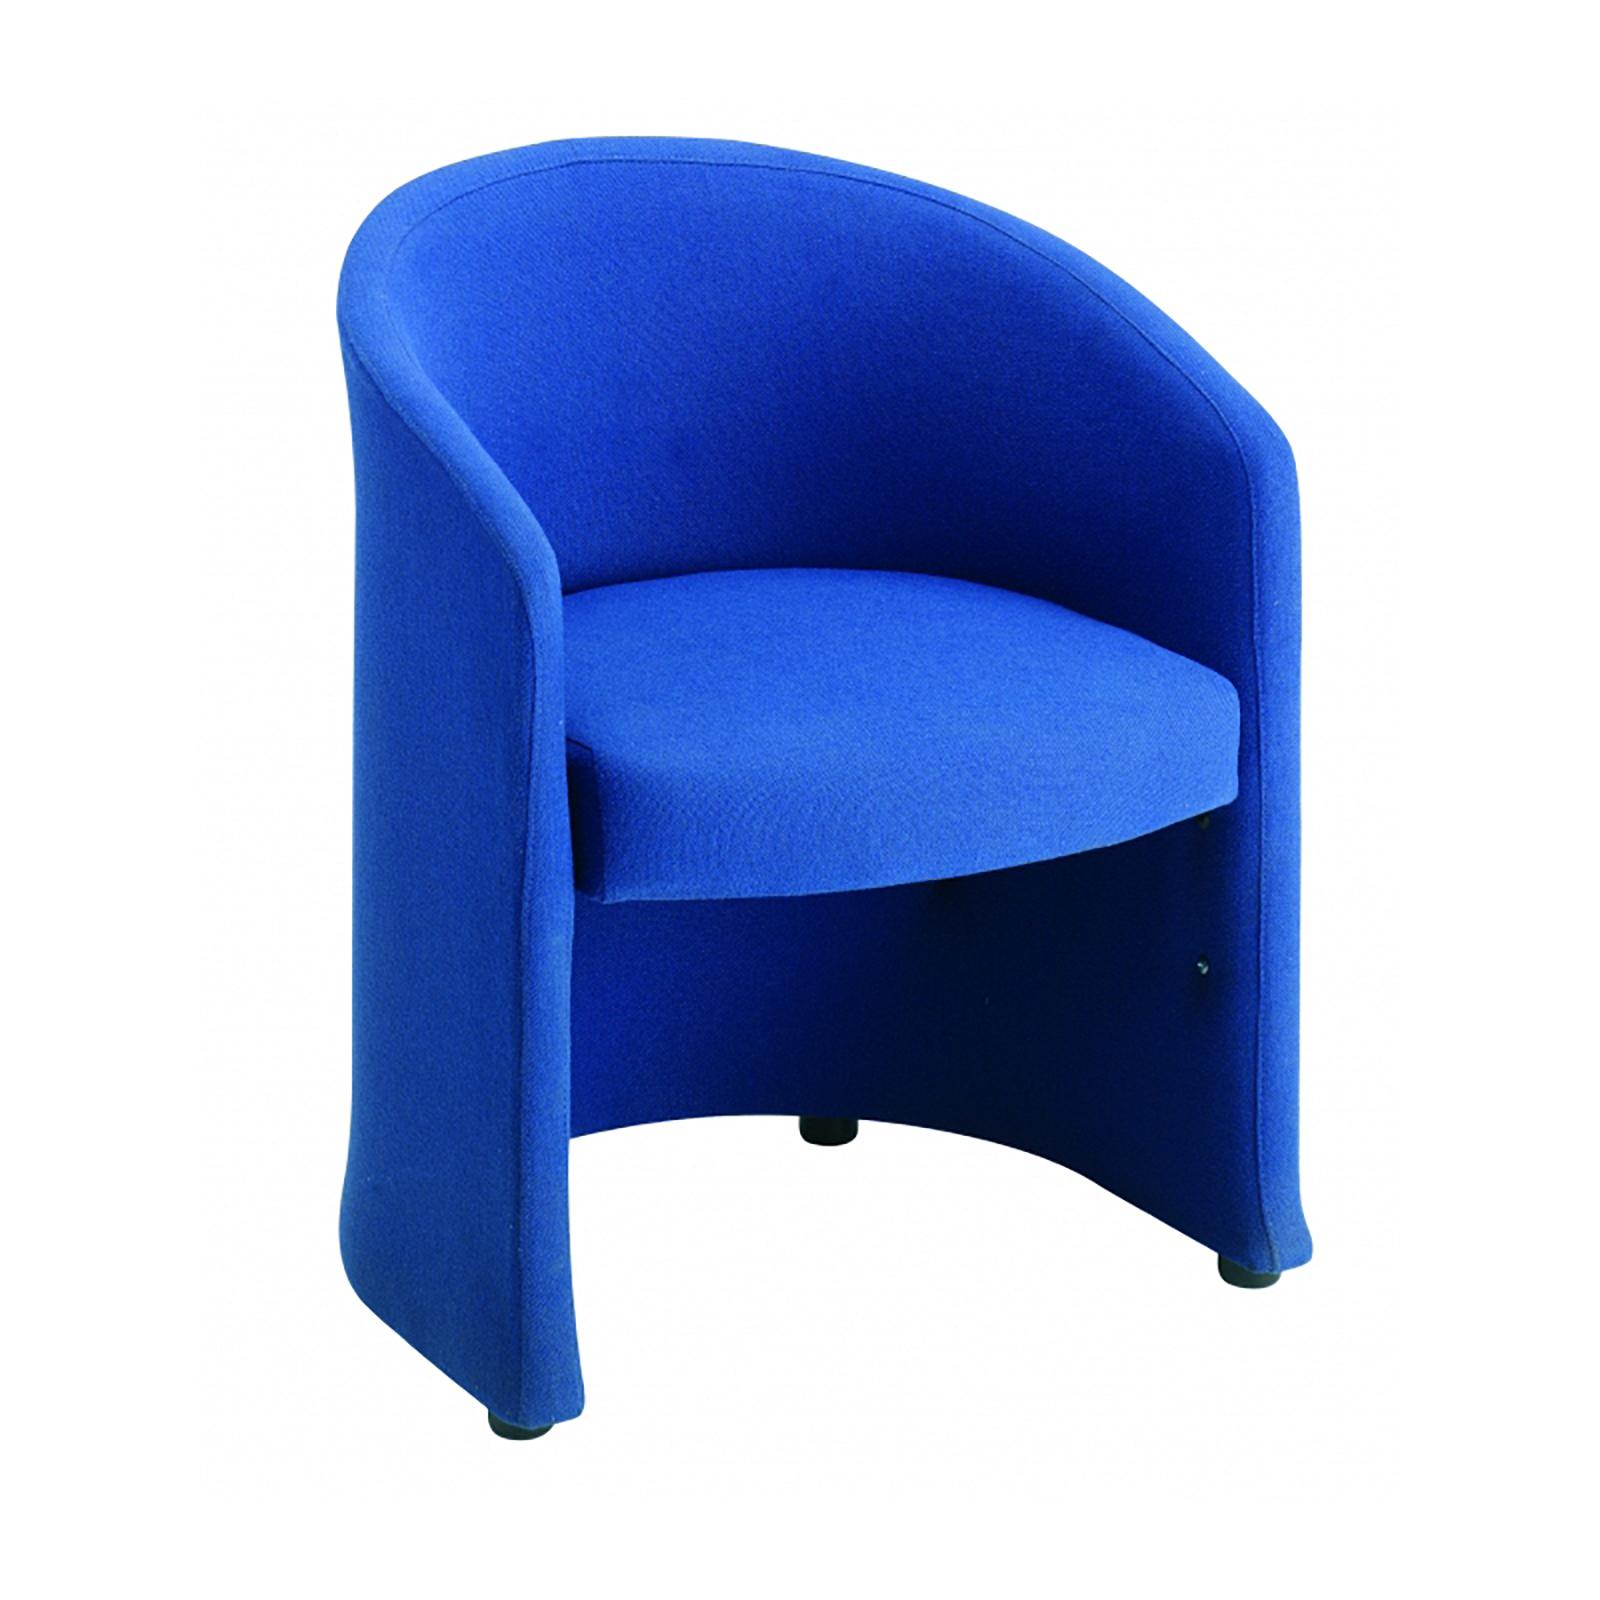 Slender fabric reception single tub chair 620mm wide - blue